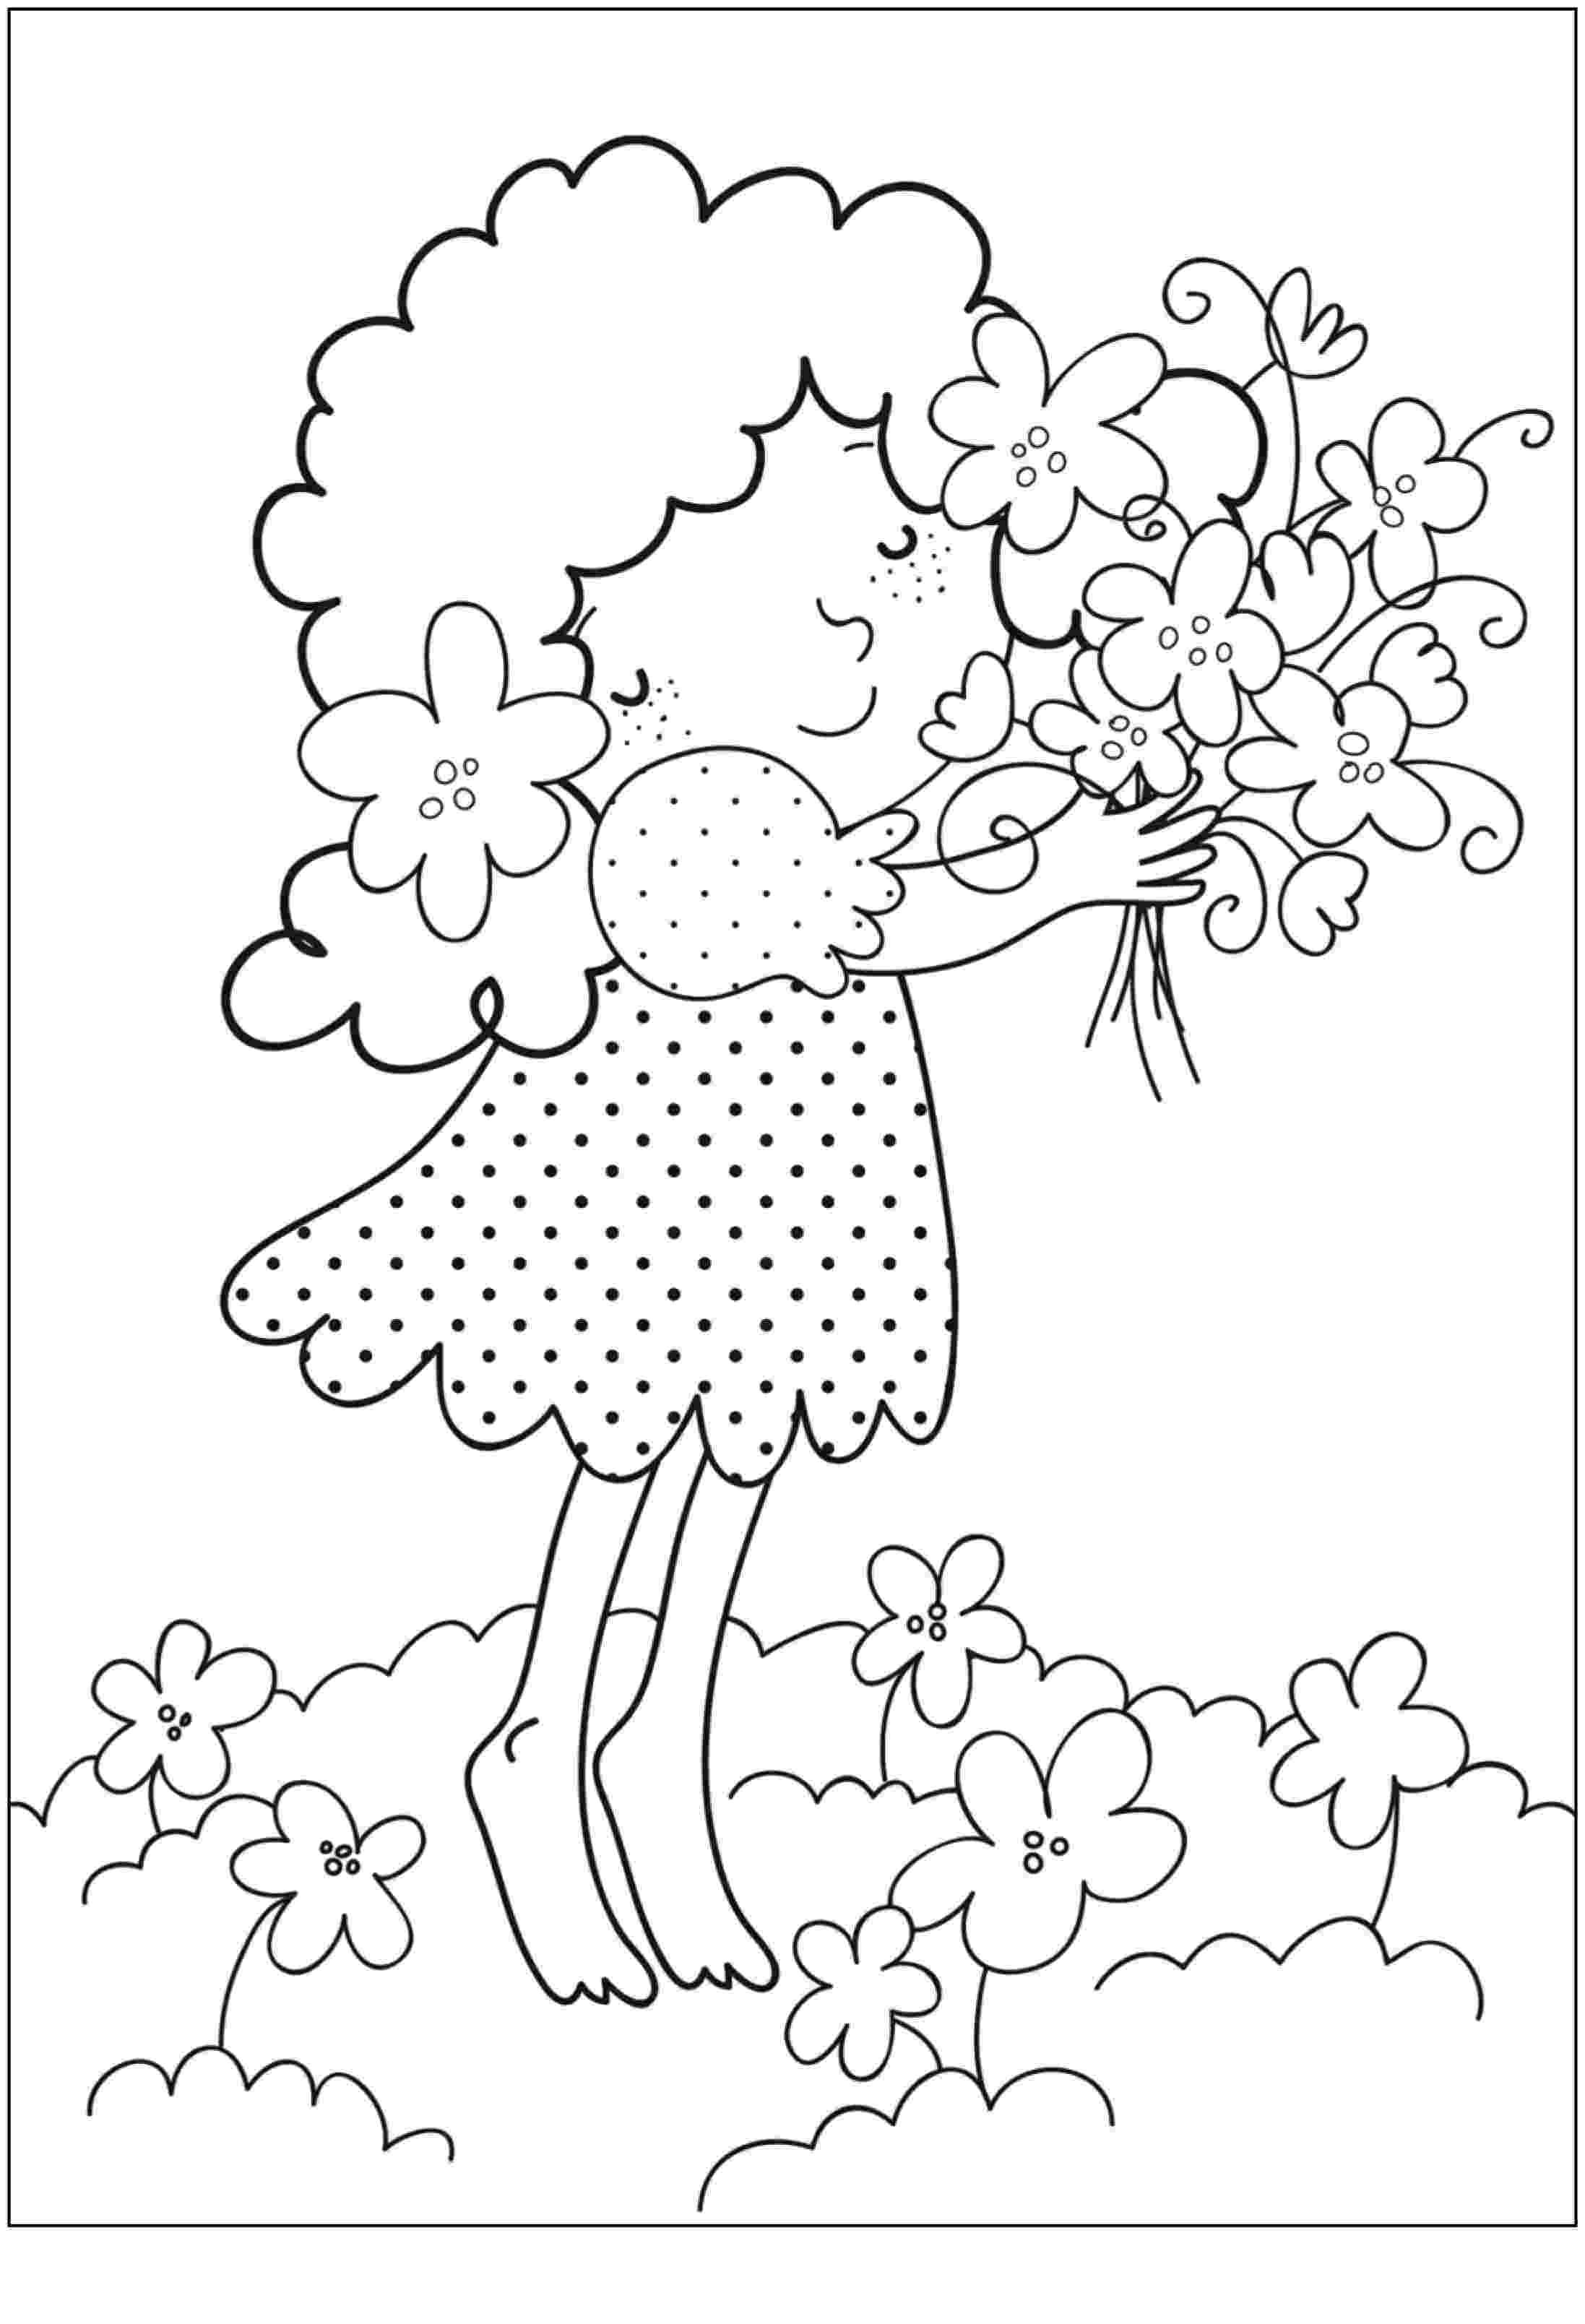 flower printables free printable flower coloring pages for kids best printables flower 1 3